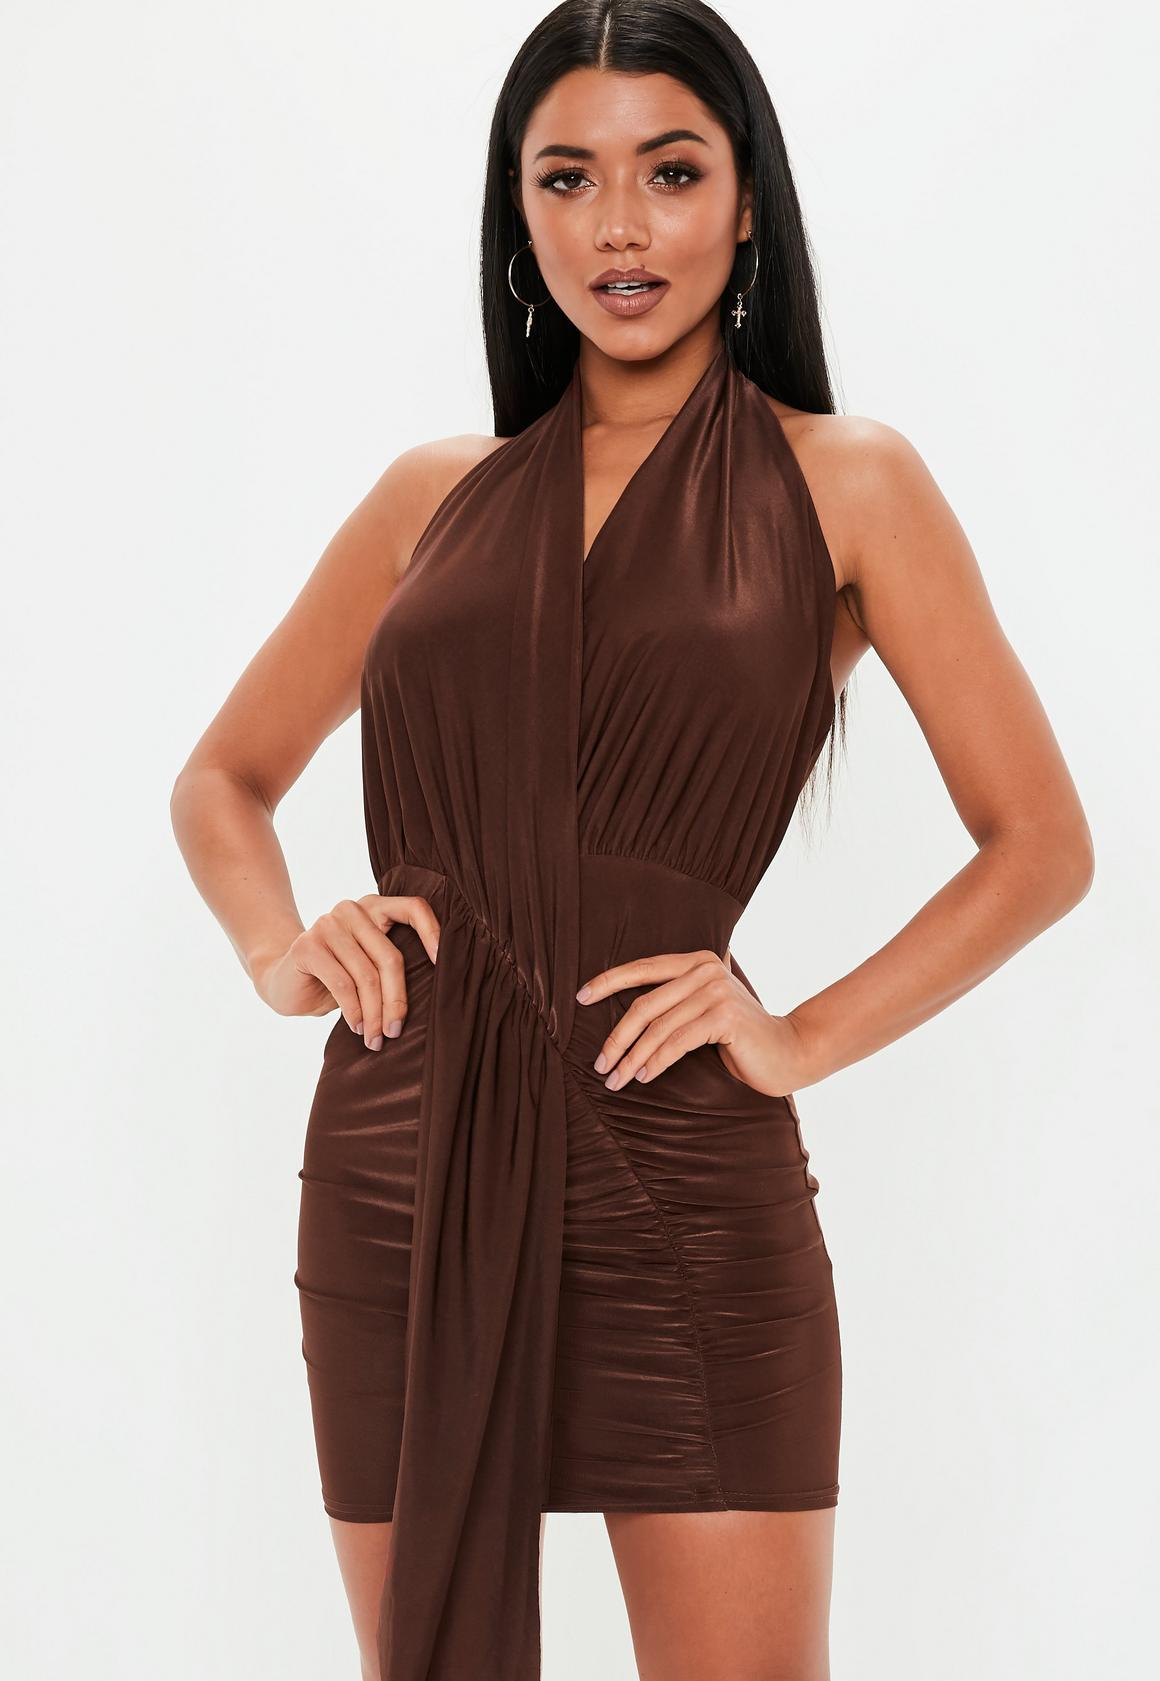 Missguided - robe dos-nu courte tissu drappé  - 1